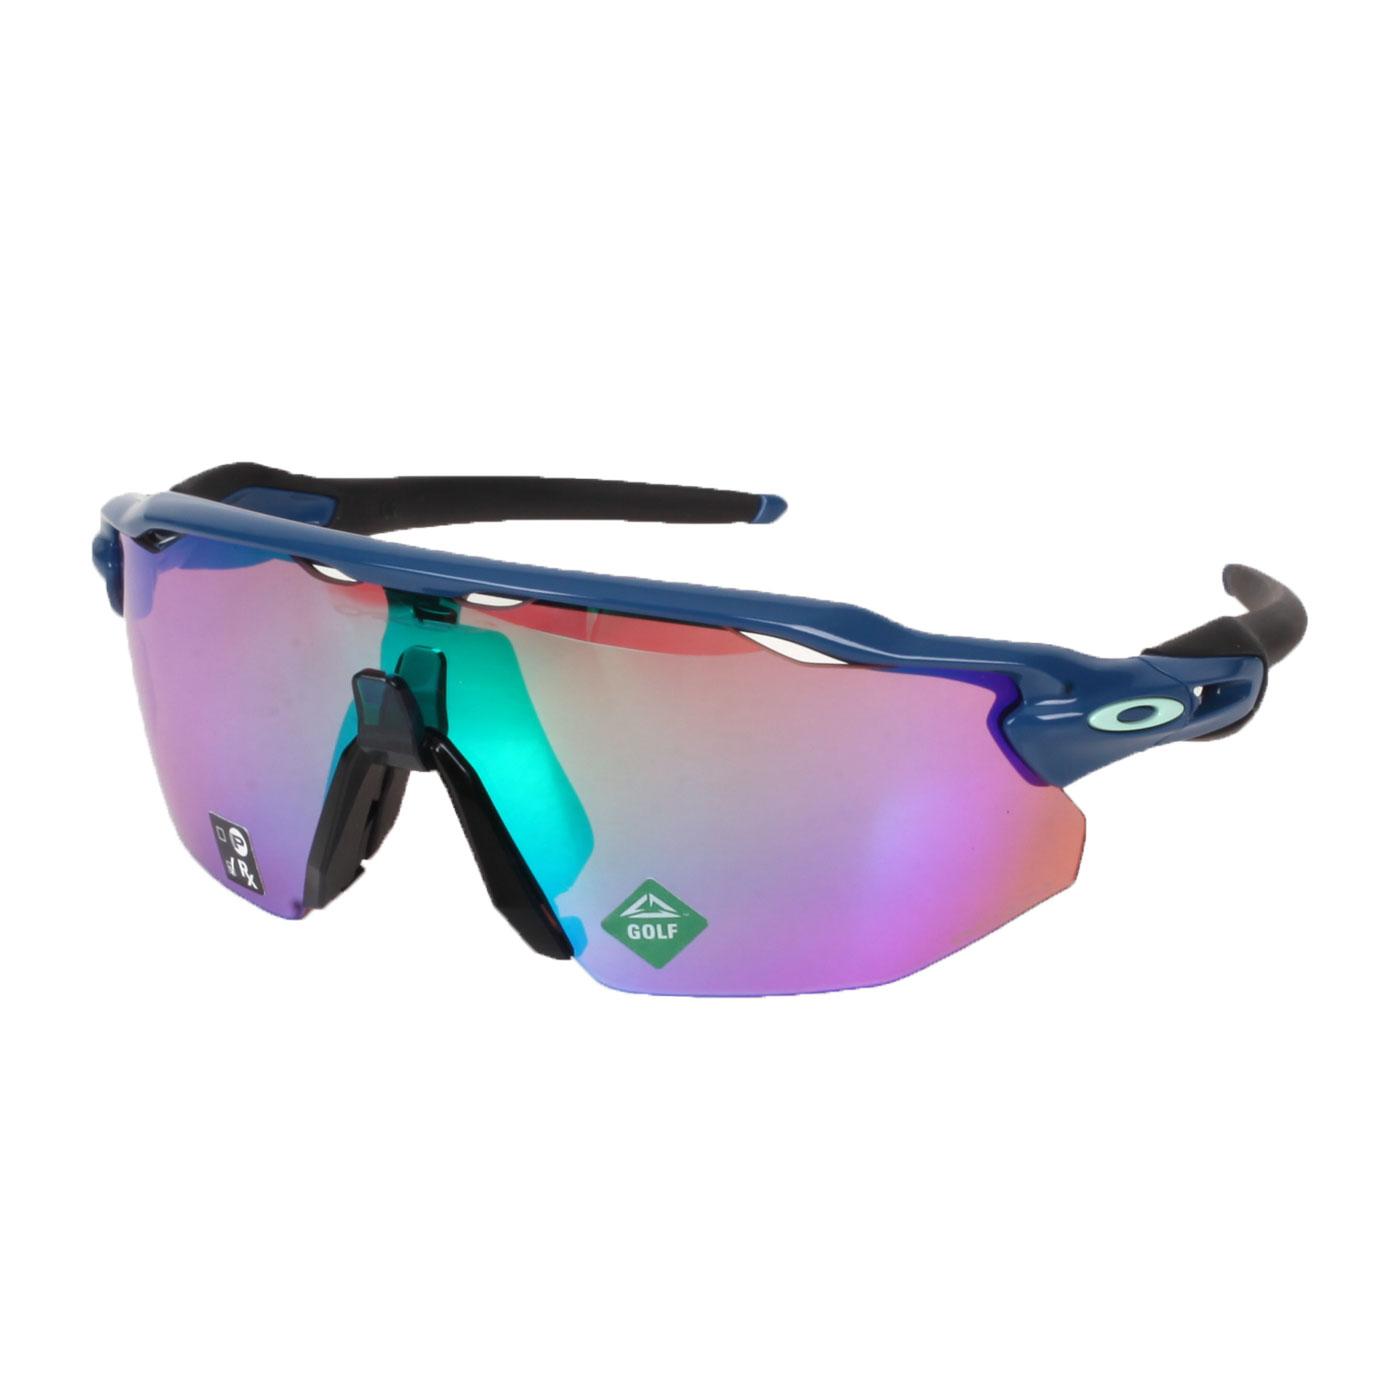 OAKLEY RADAR EV ADVANCER一般太陽眼鏡(附硬盒鼻墊) OAK-OO9442-0738 - 藍黑